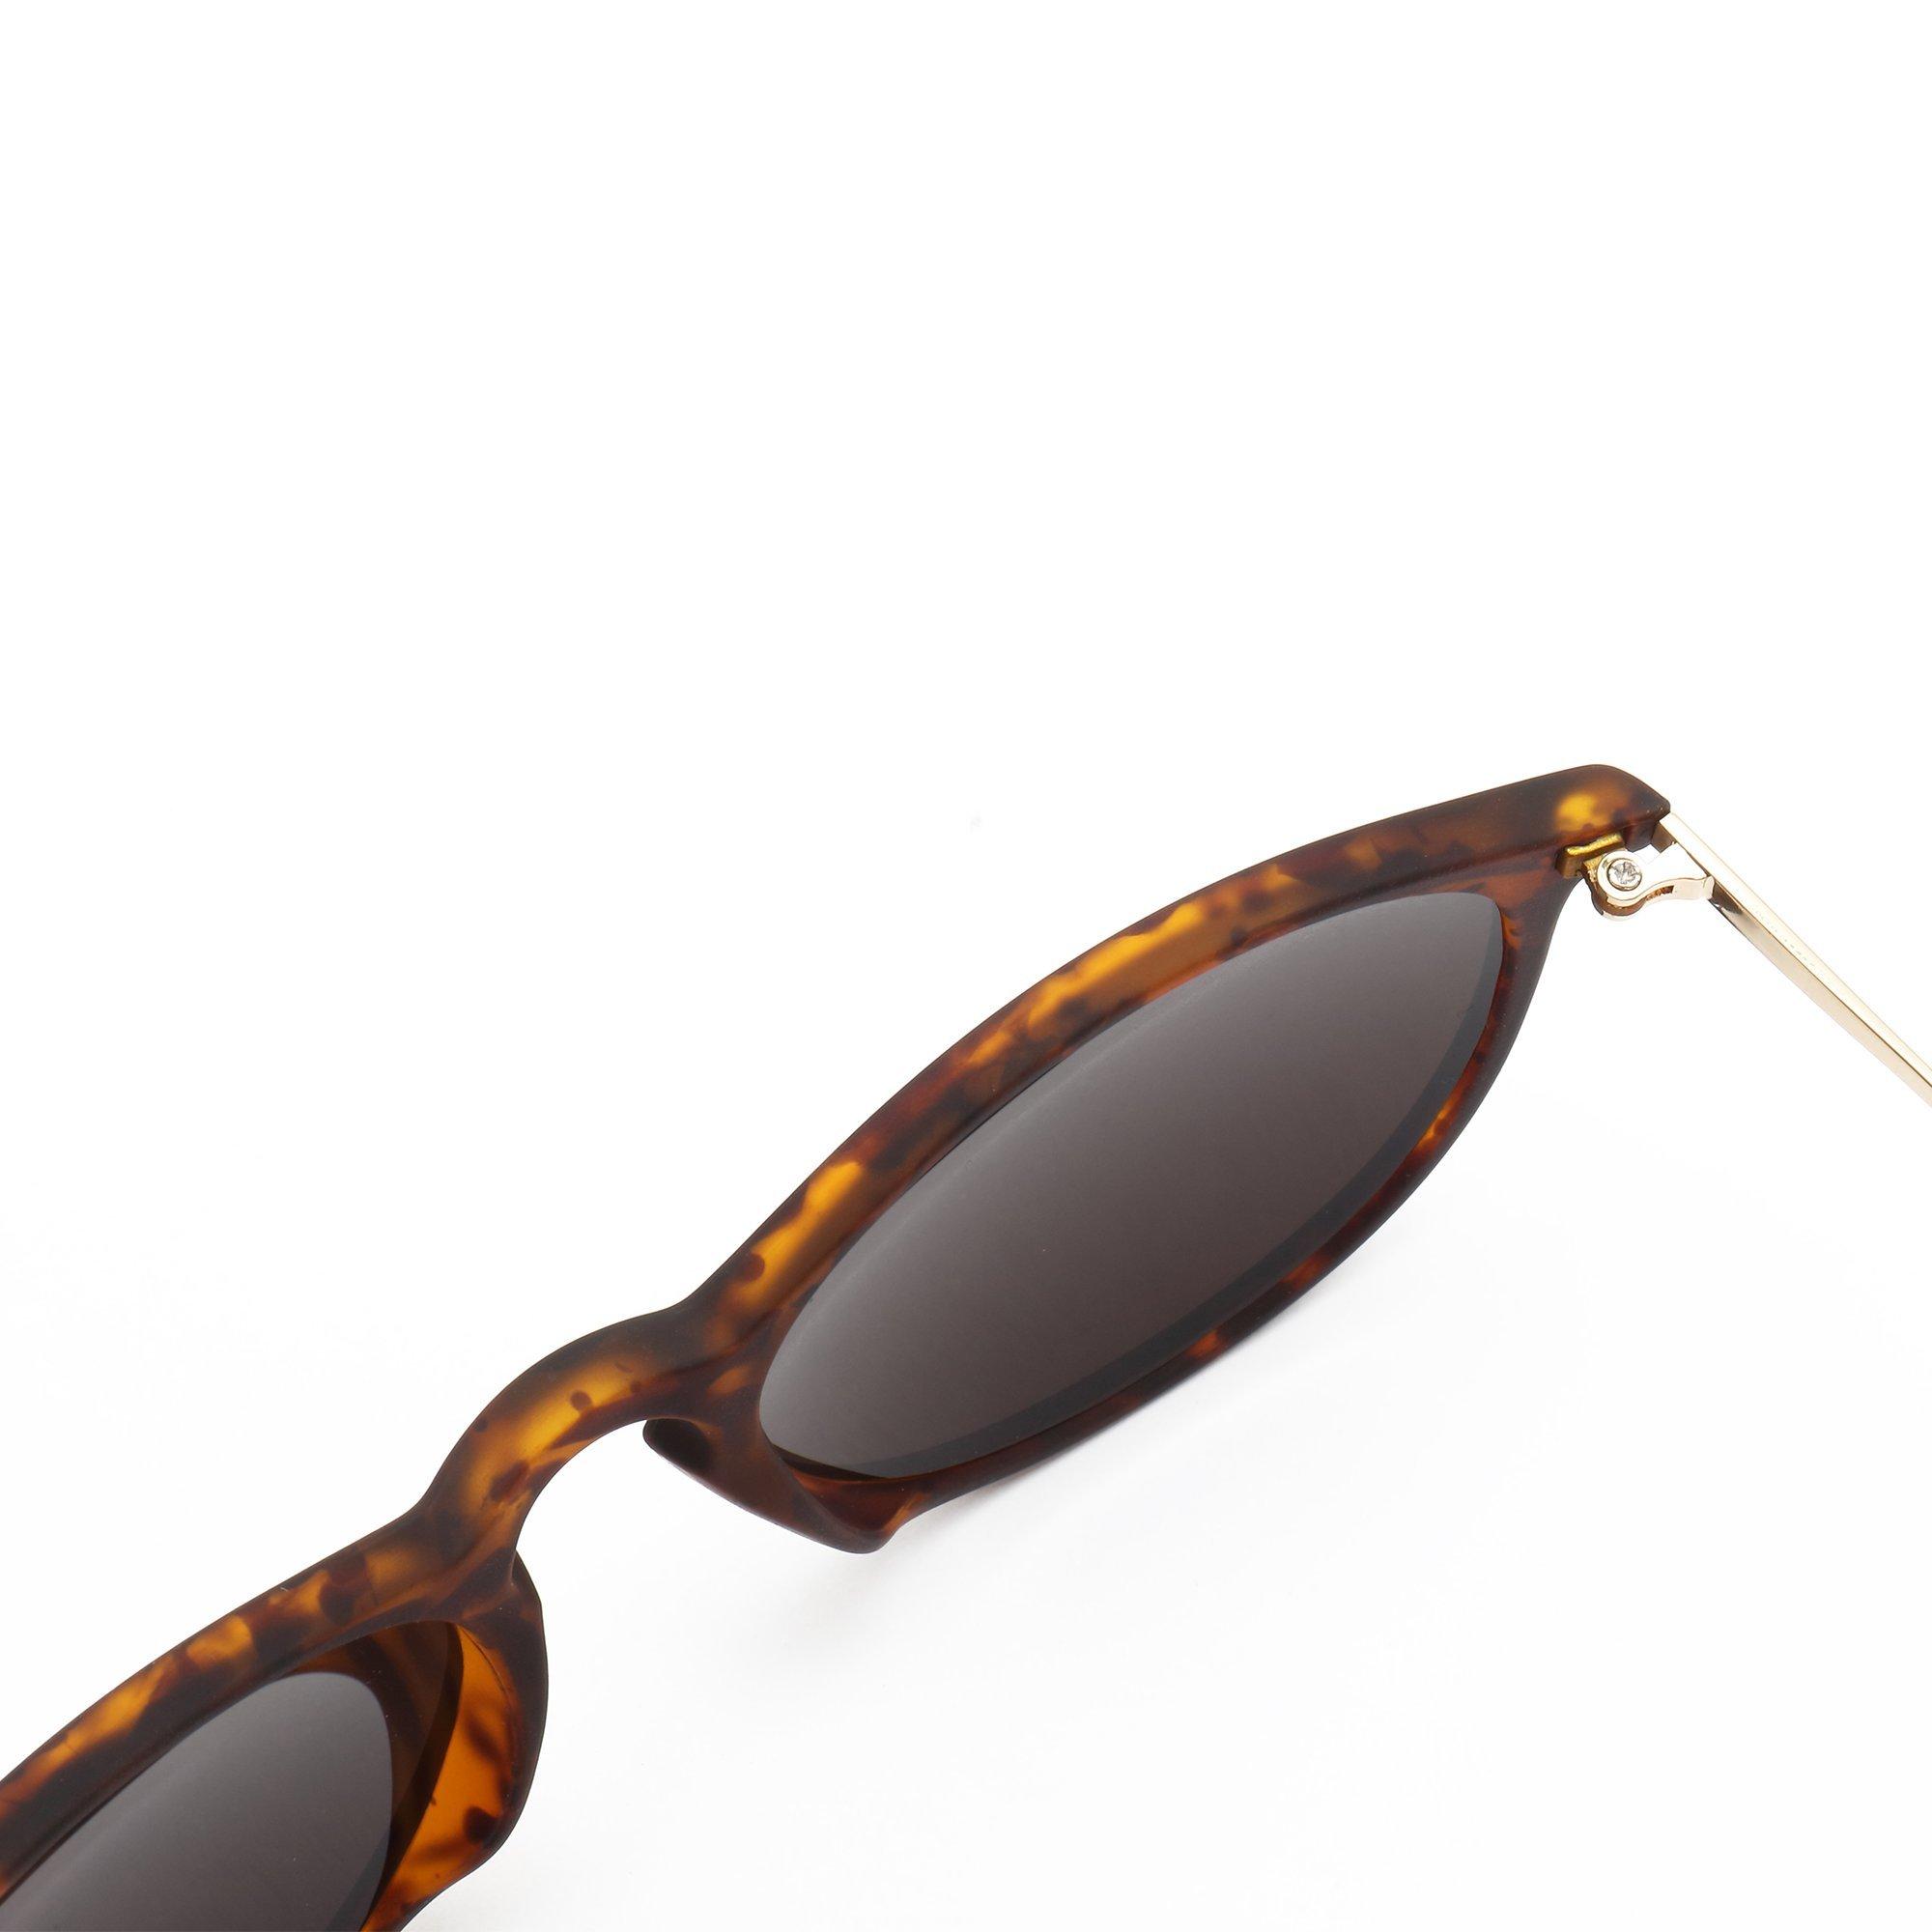 29e6f1ac2fc SUNGAIT Vintage Round Sunglasses for Women Erika Retro Style (Amber ...